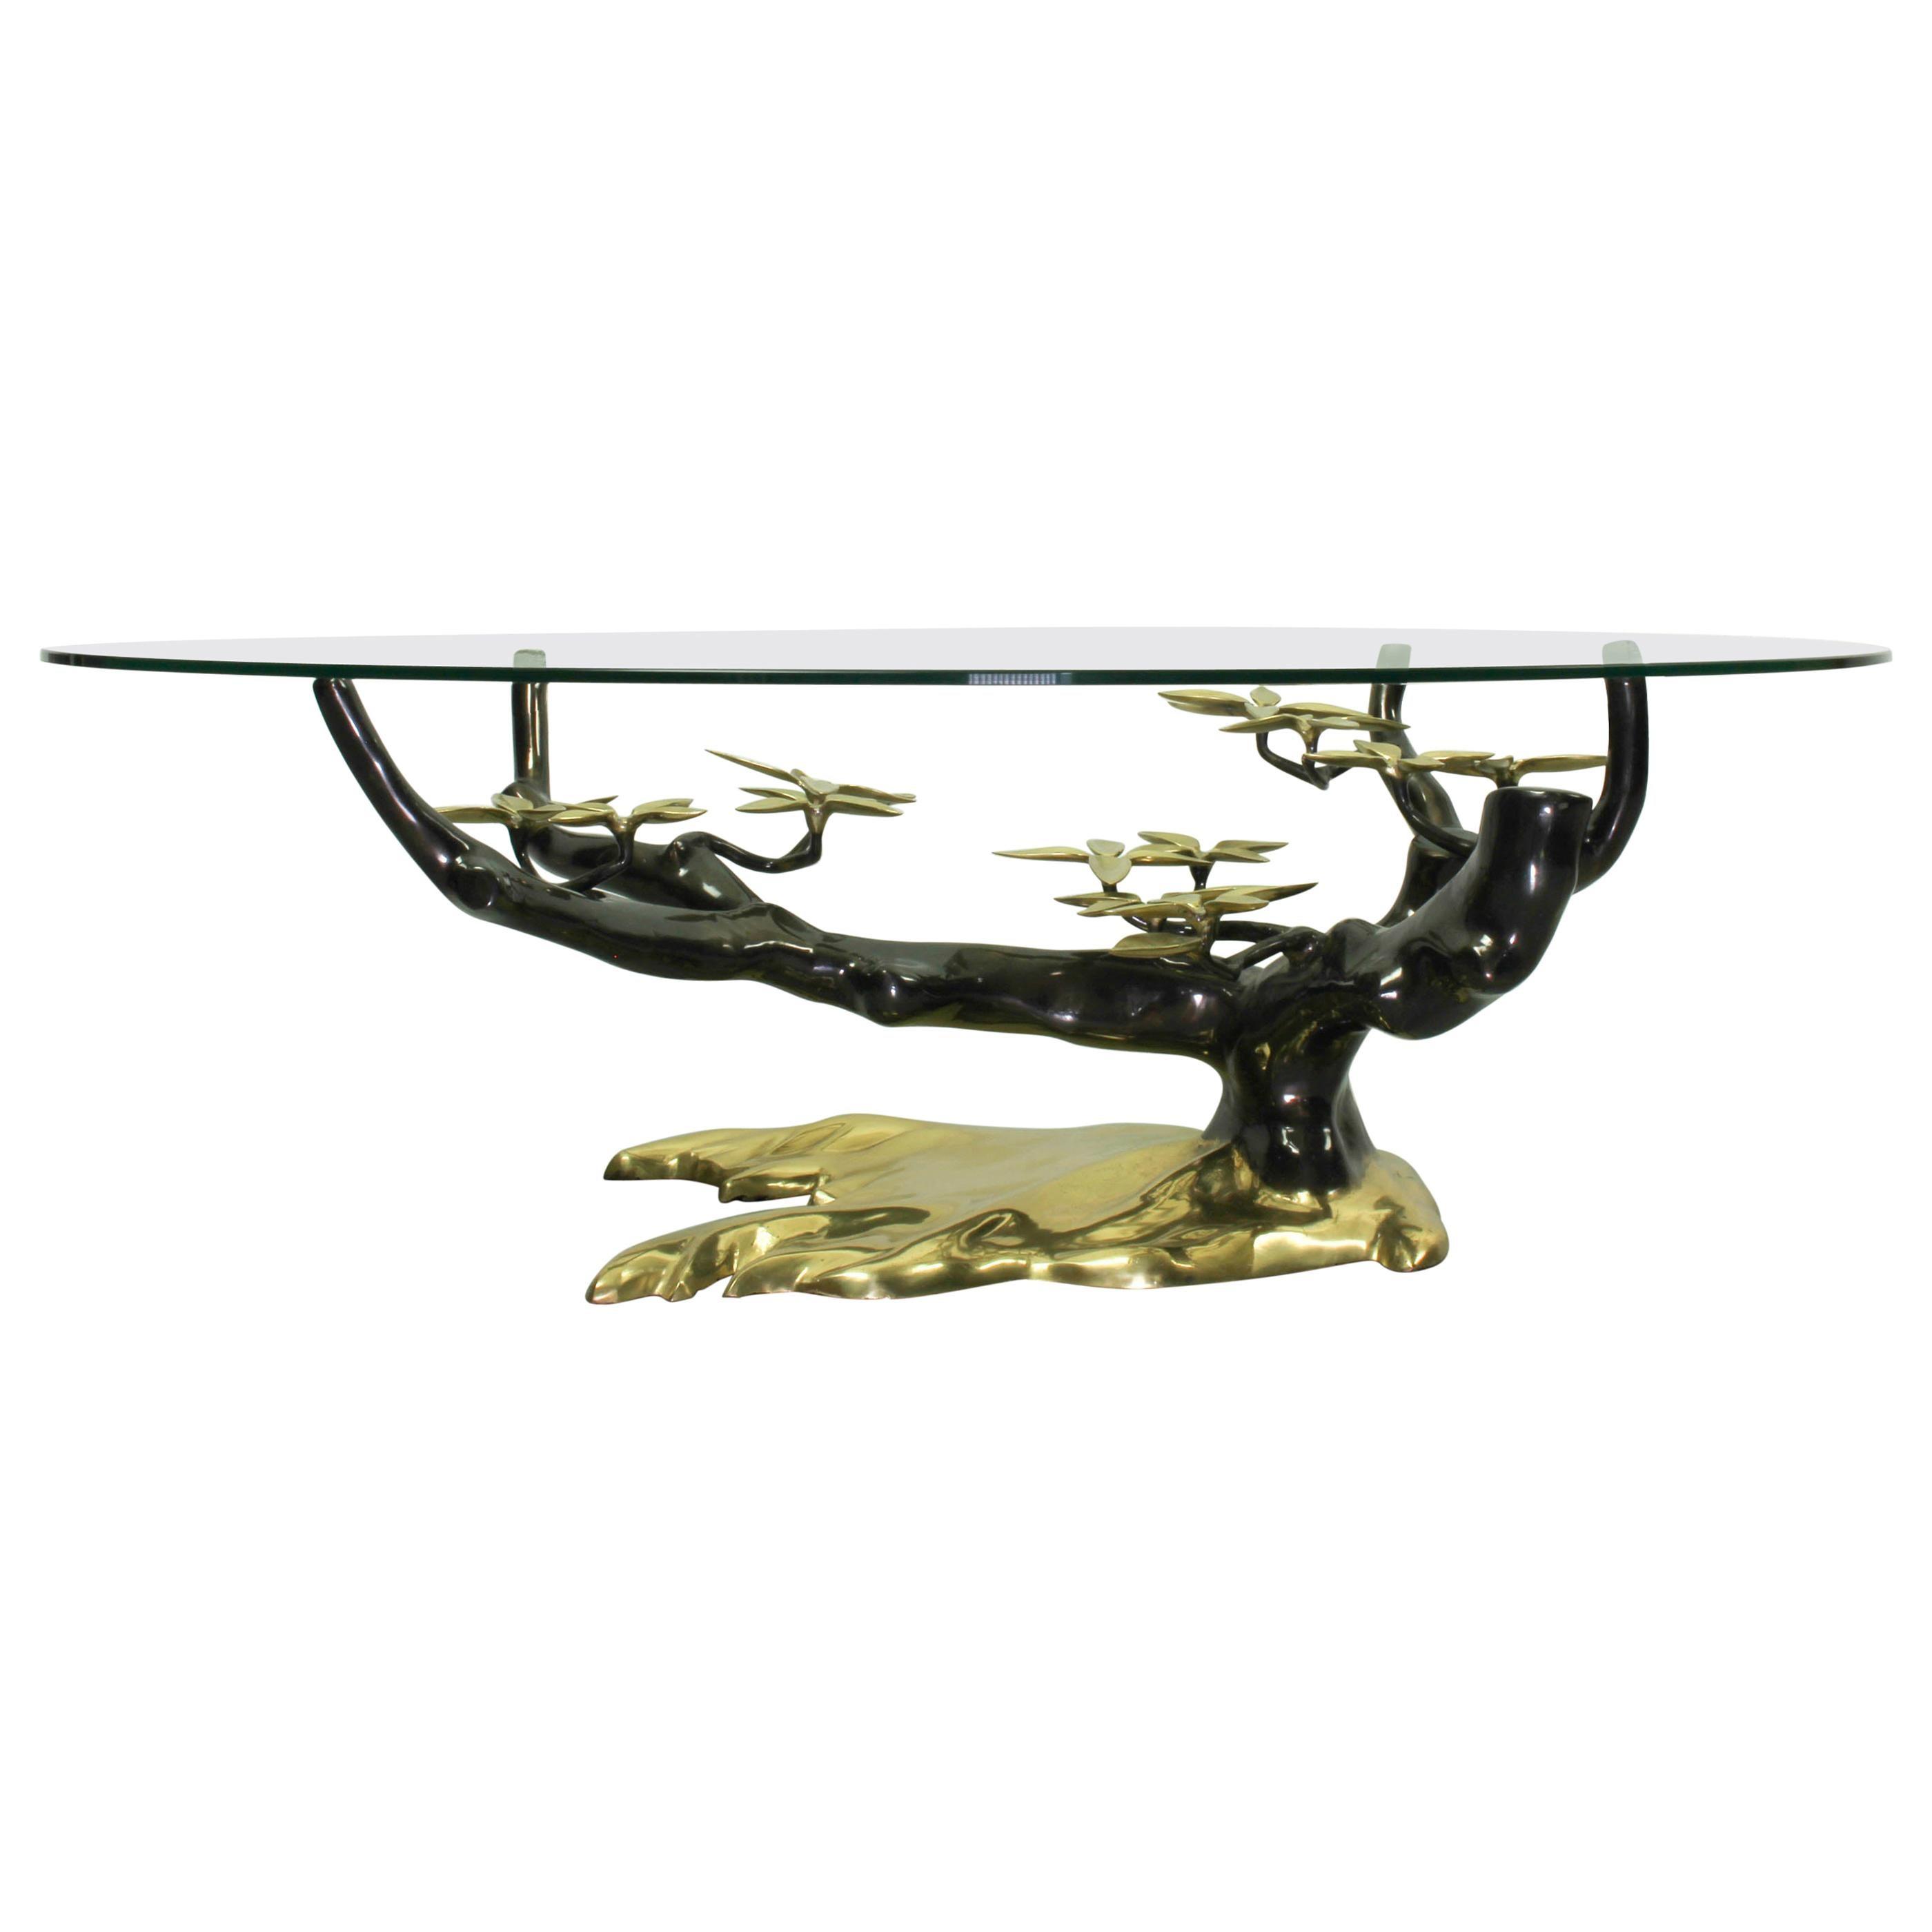 Bonsai Brass & Glass Coffee Table, Willy Daro, 1970s